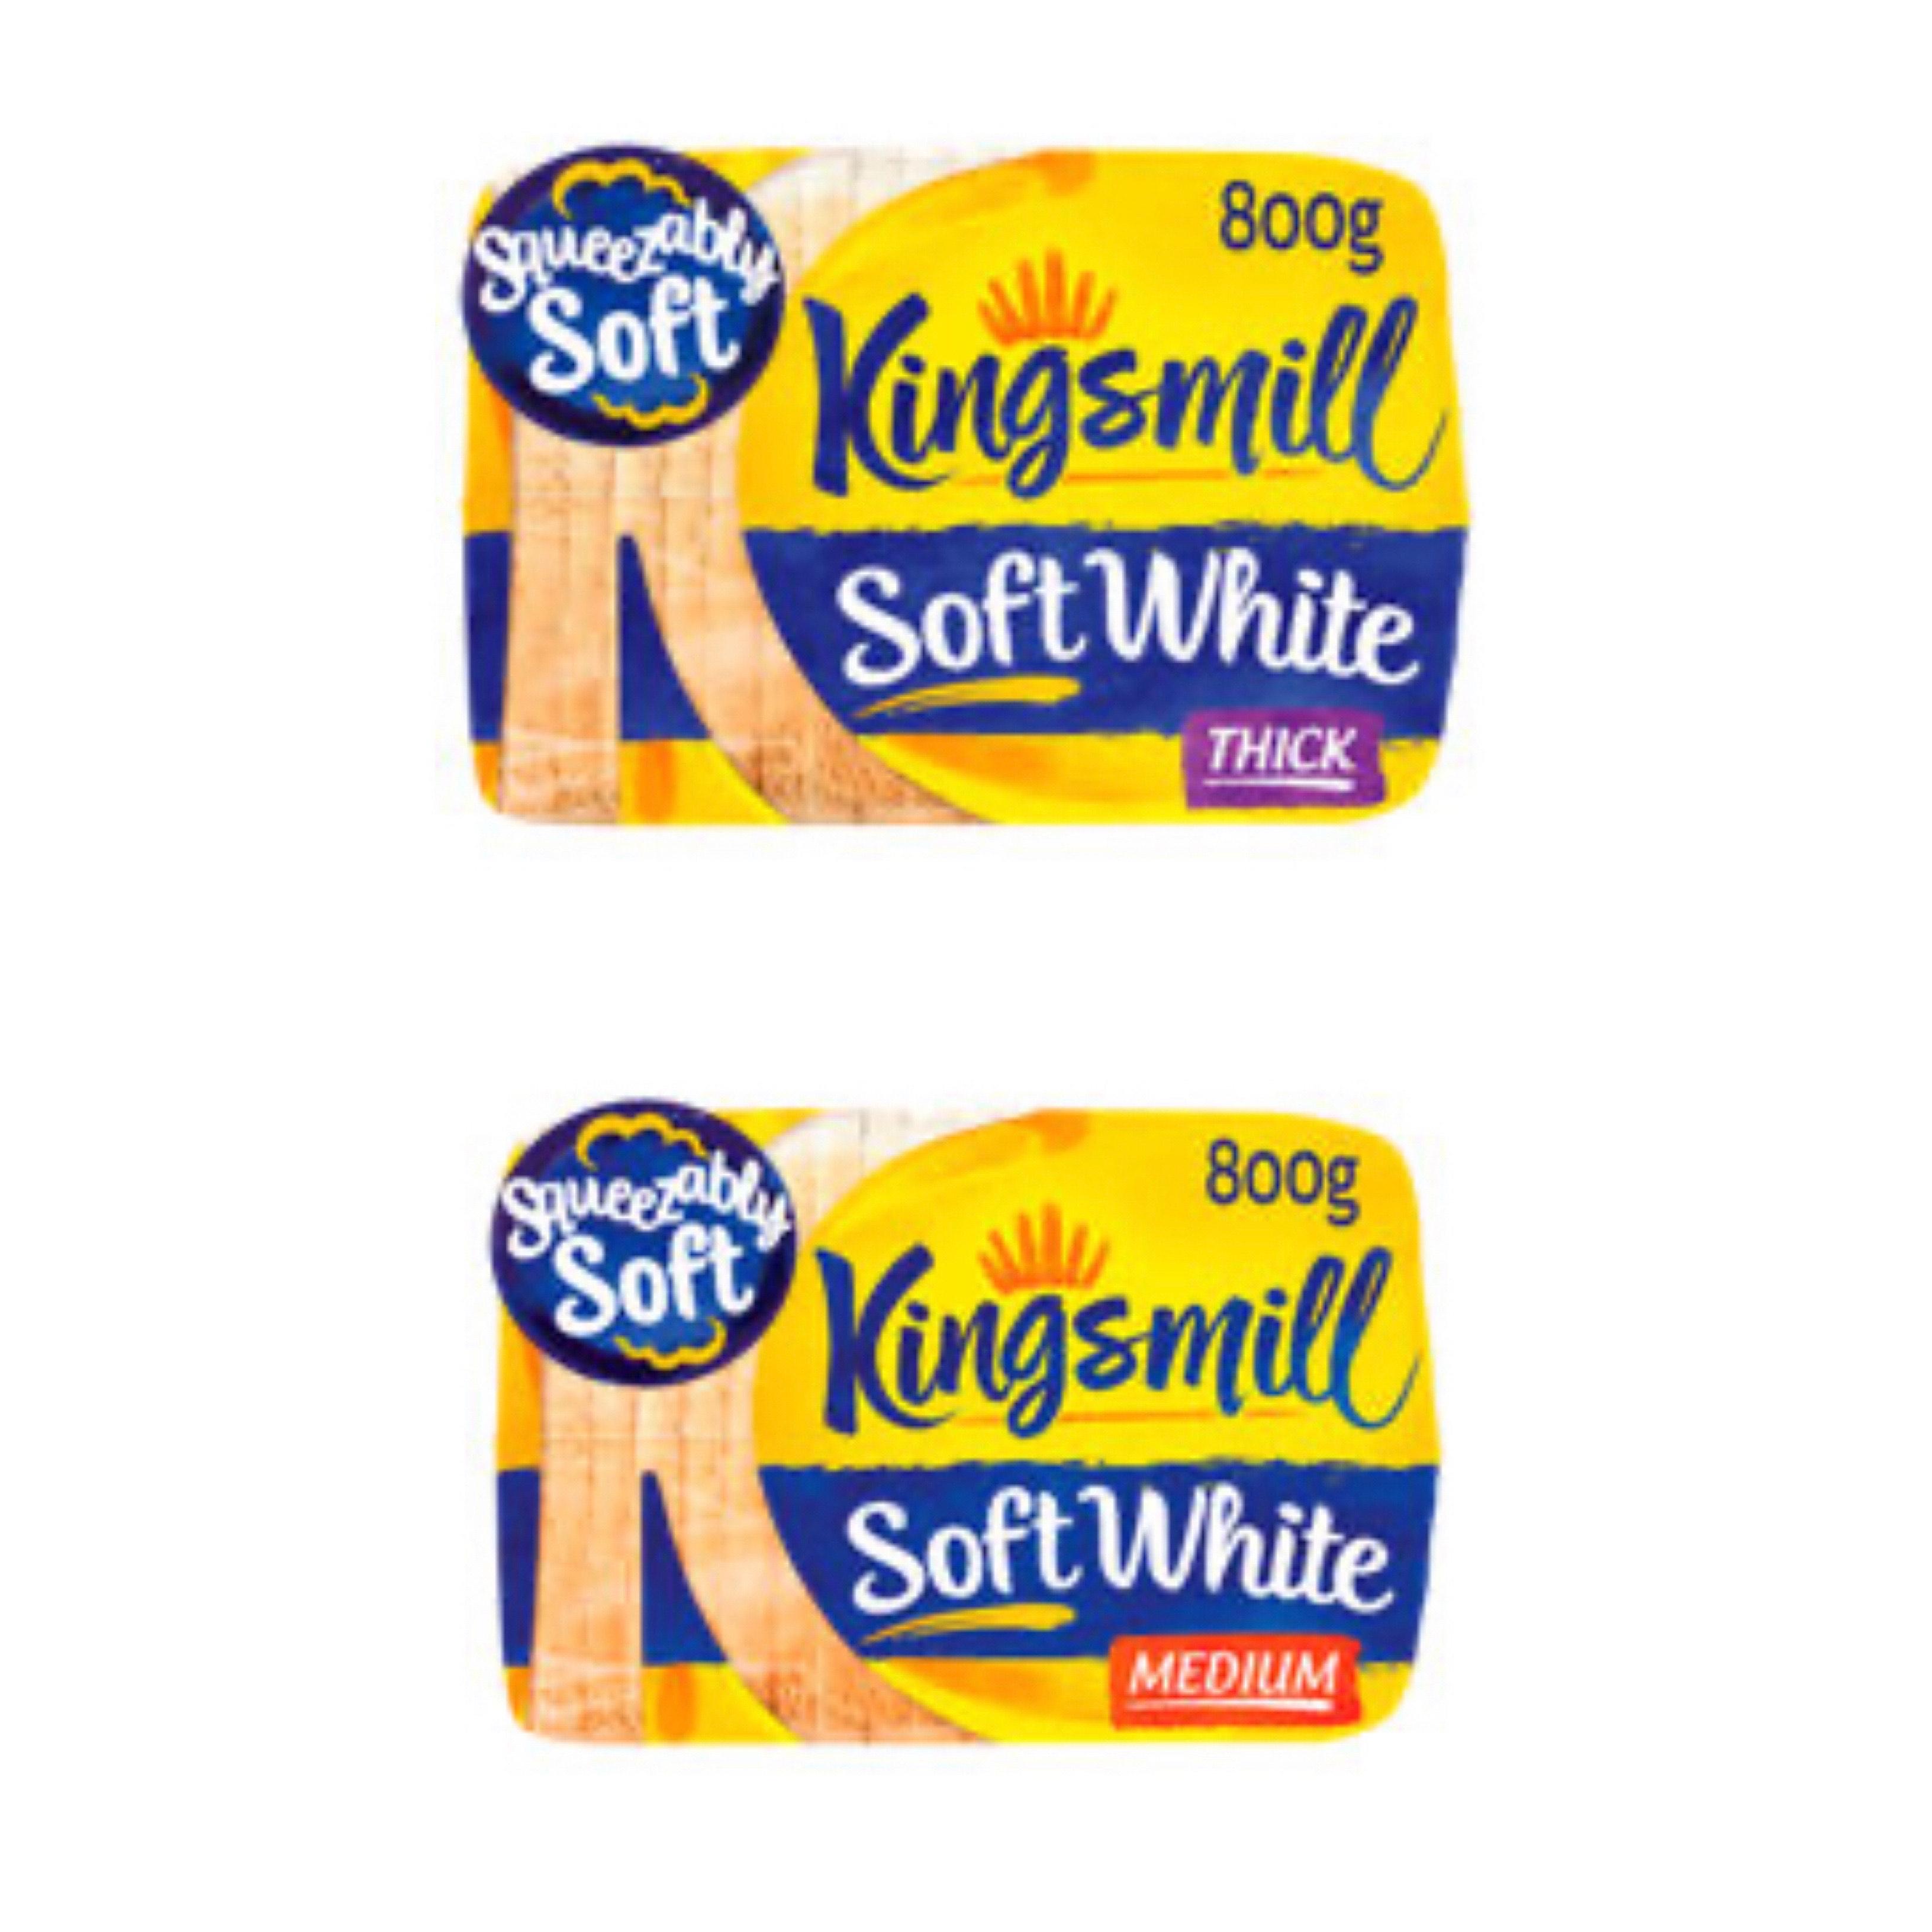 Kingsmill Thick / Medium Soft White Bread 800g 79p at Asda